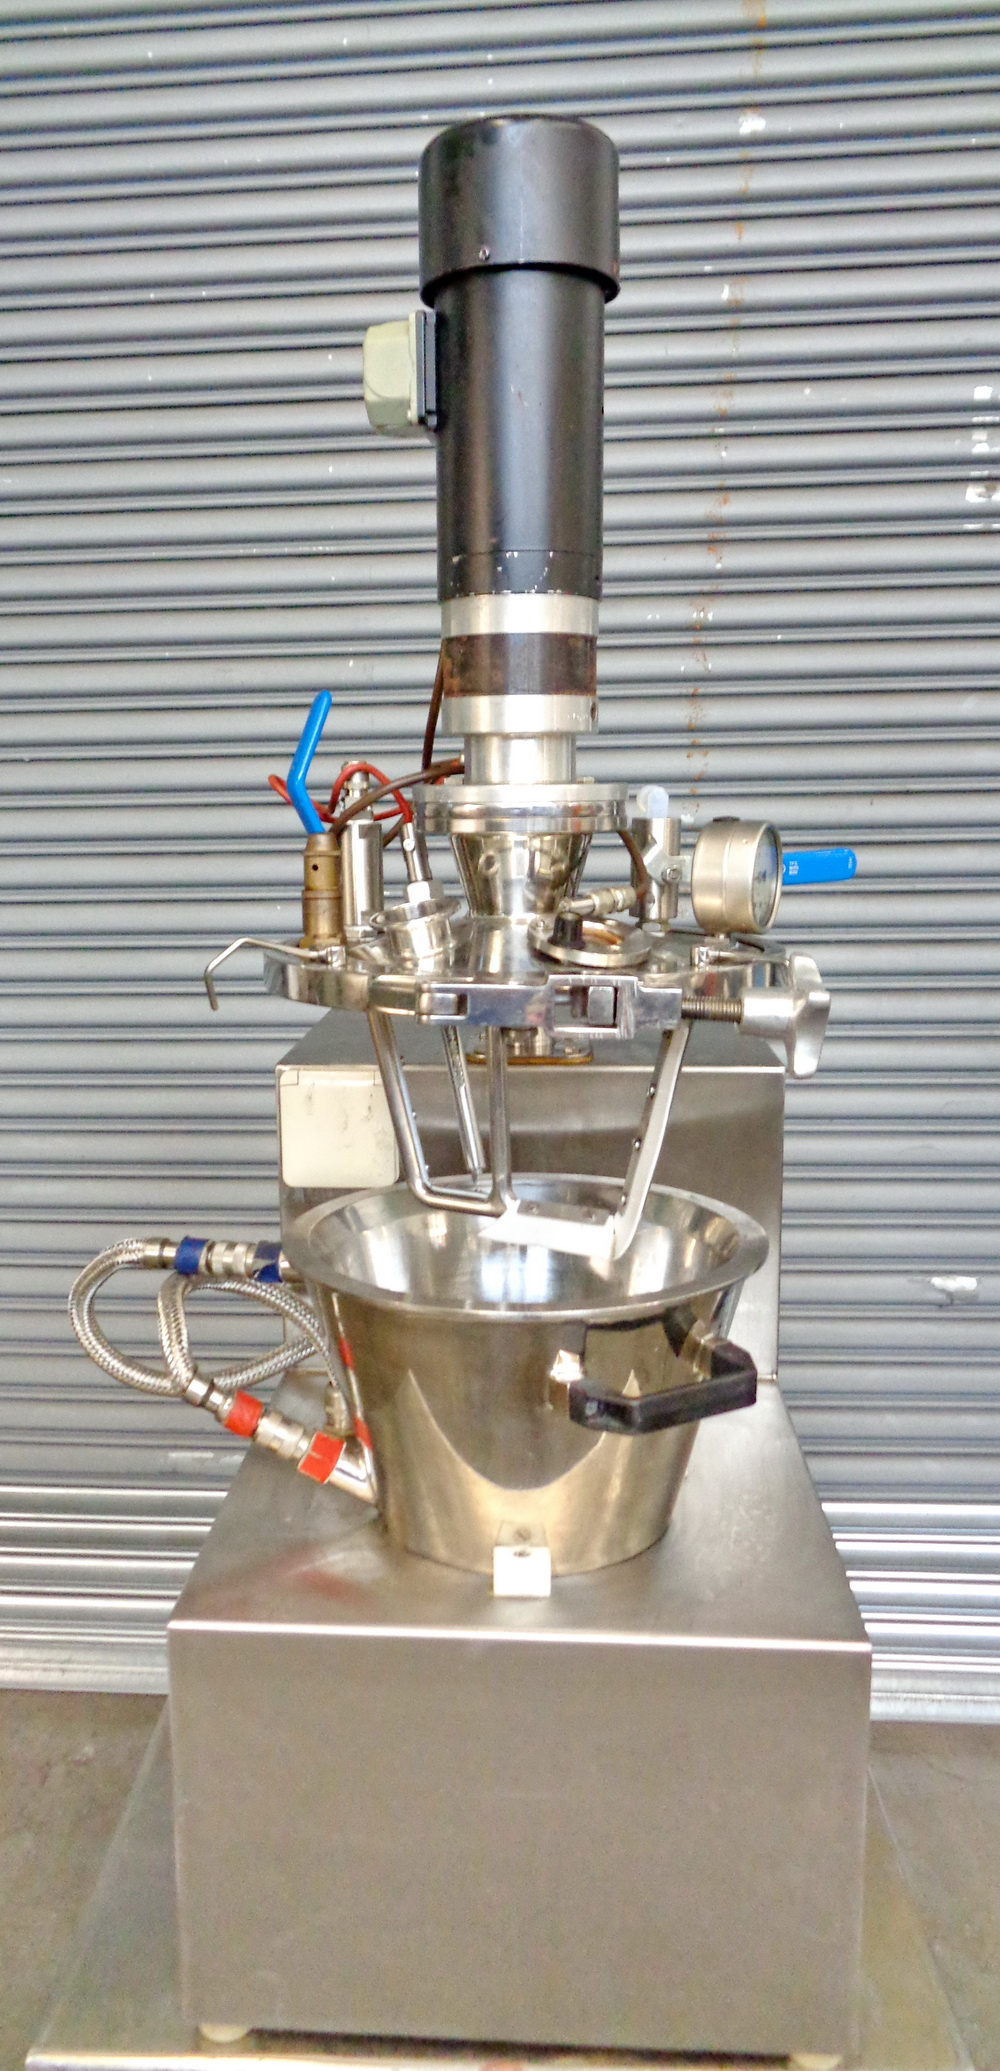 Haagen Rinau (Ekato) 1 gallon SS Vacuum/Jacketed Lab Process Mixer, Model Unimix, S/N 866-3276 - Image 4 of 10